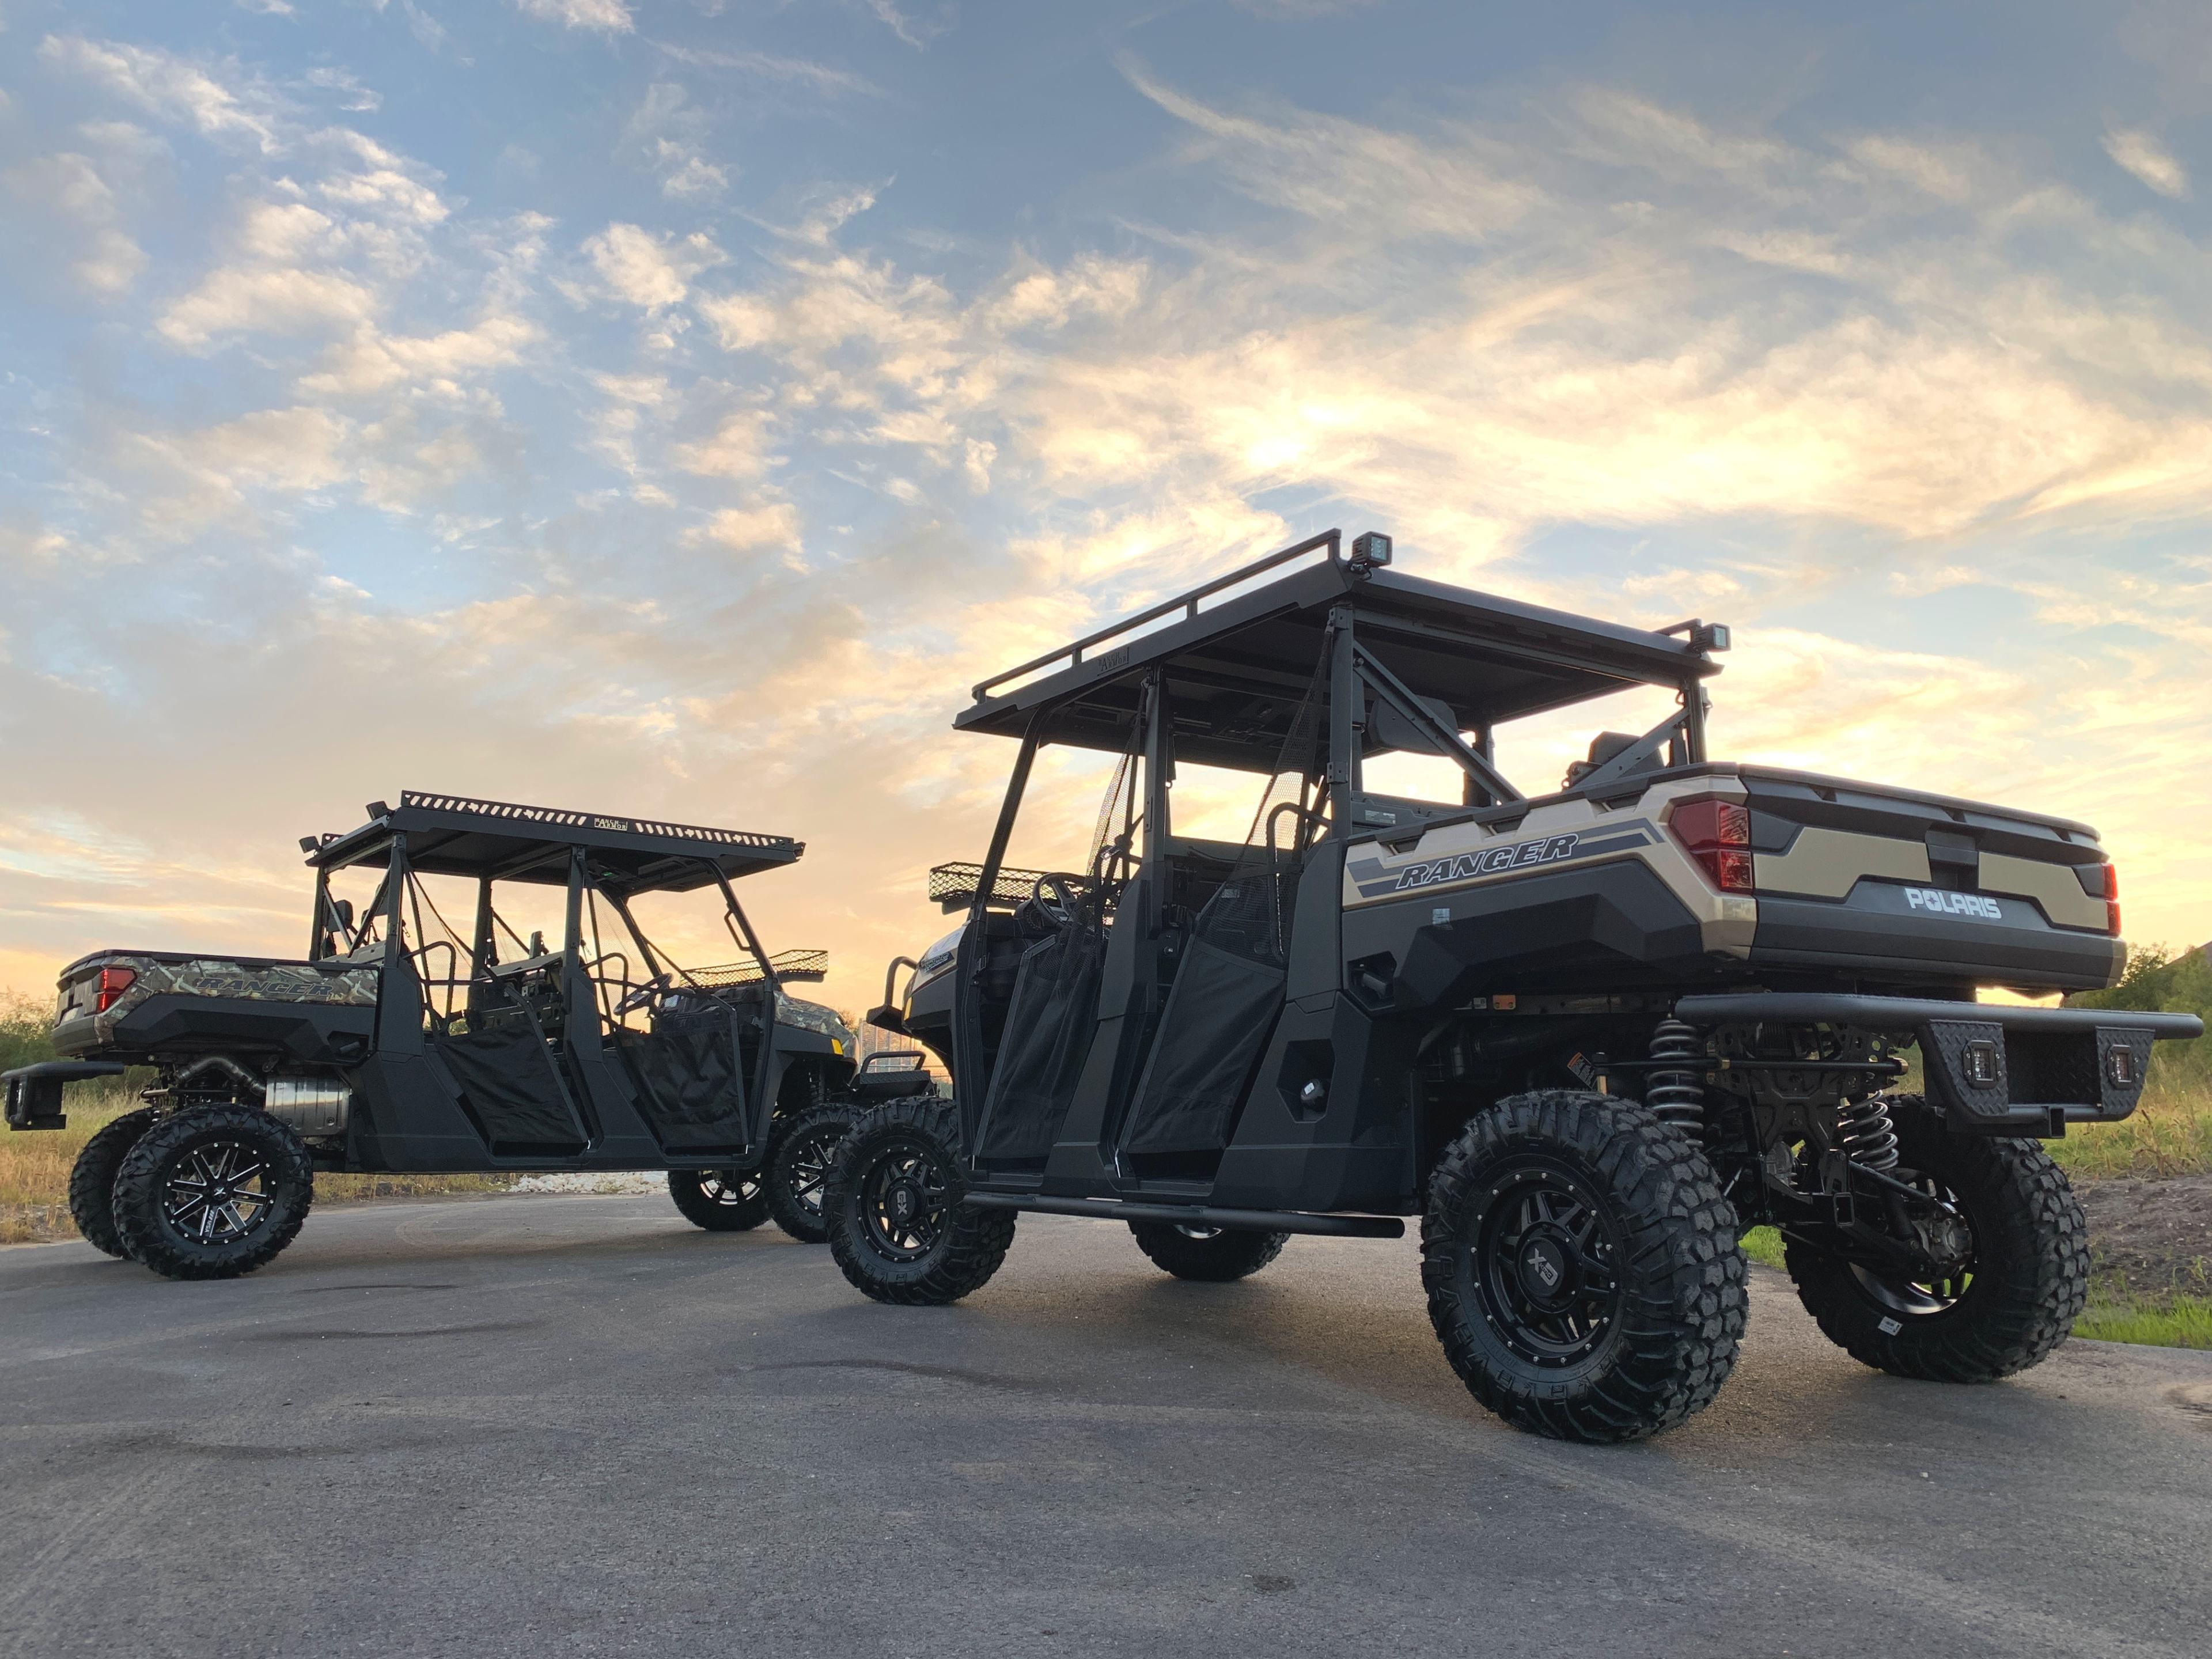 polaris-ranger-1000-rear-bumper-in-sunset-by-ranch-armor.jpg